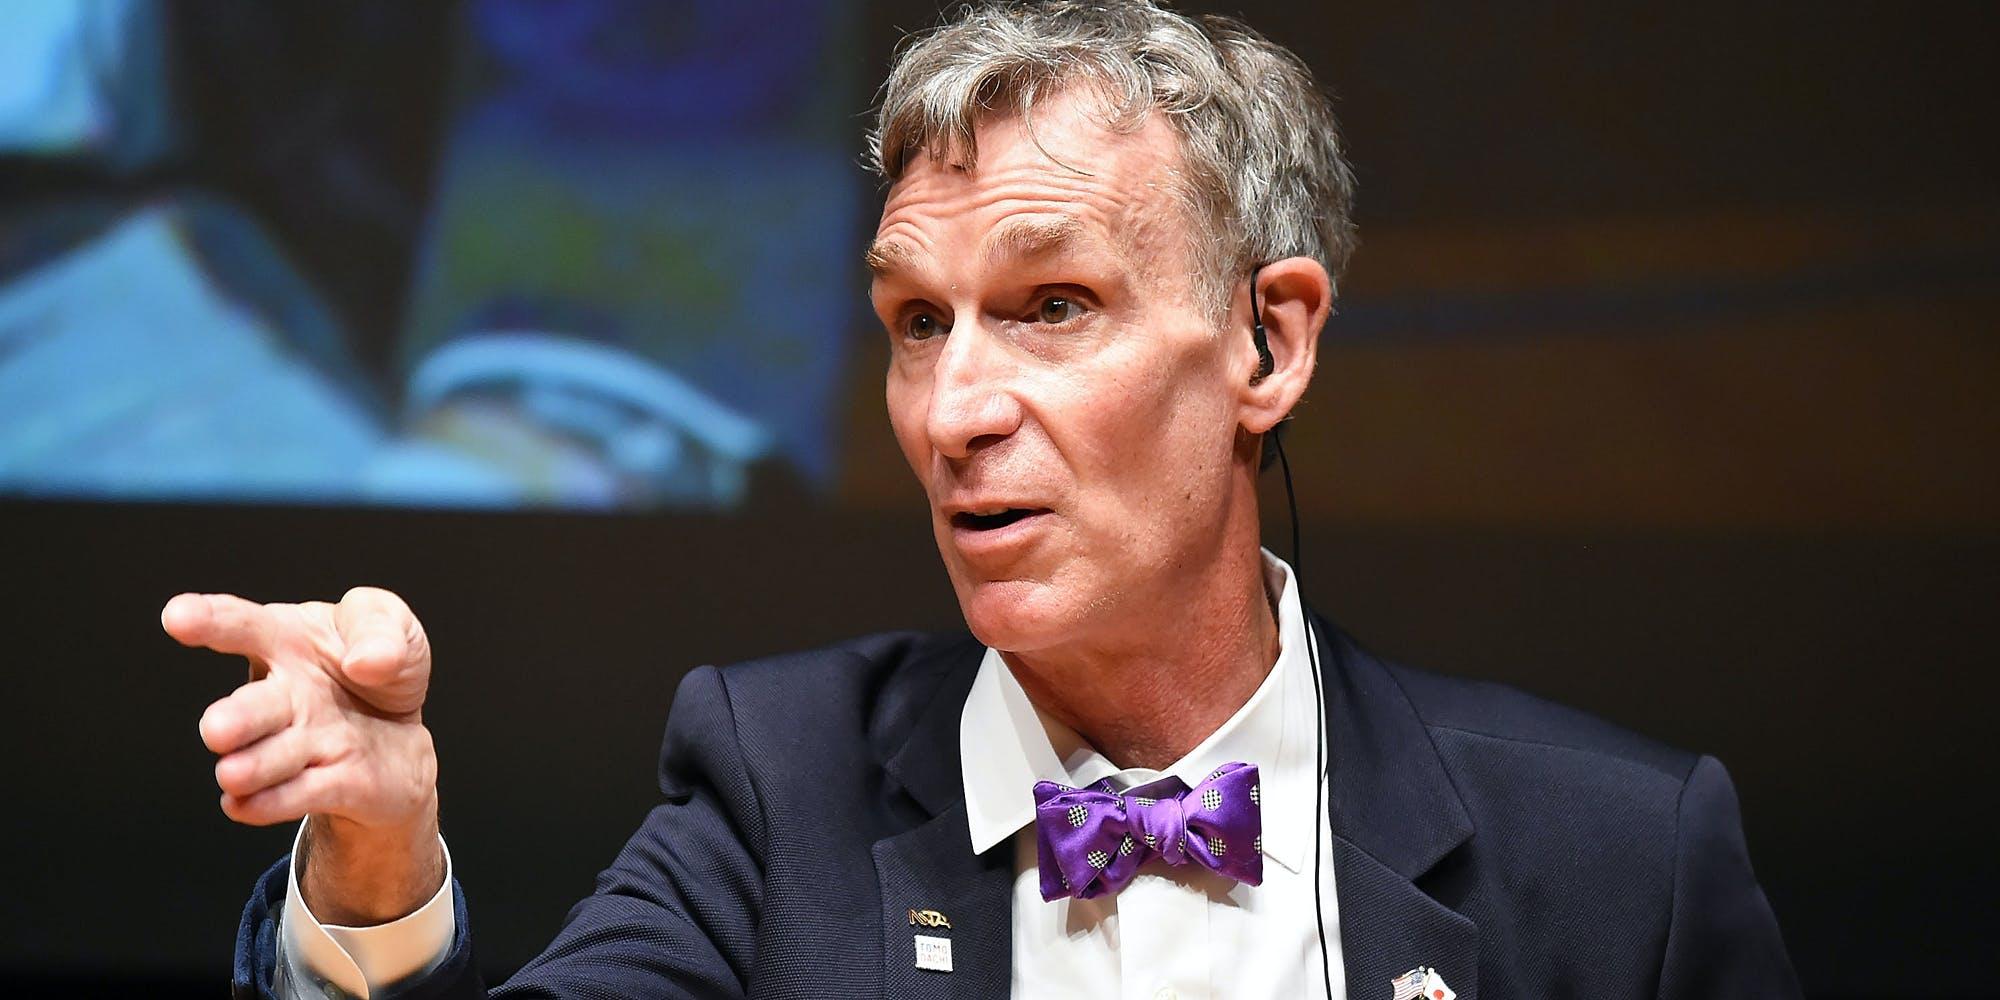 Bill Nye Medical marijuana research